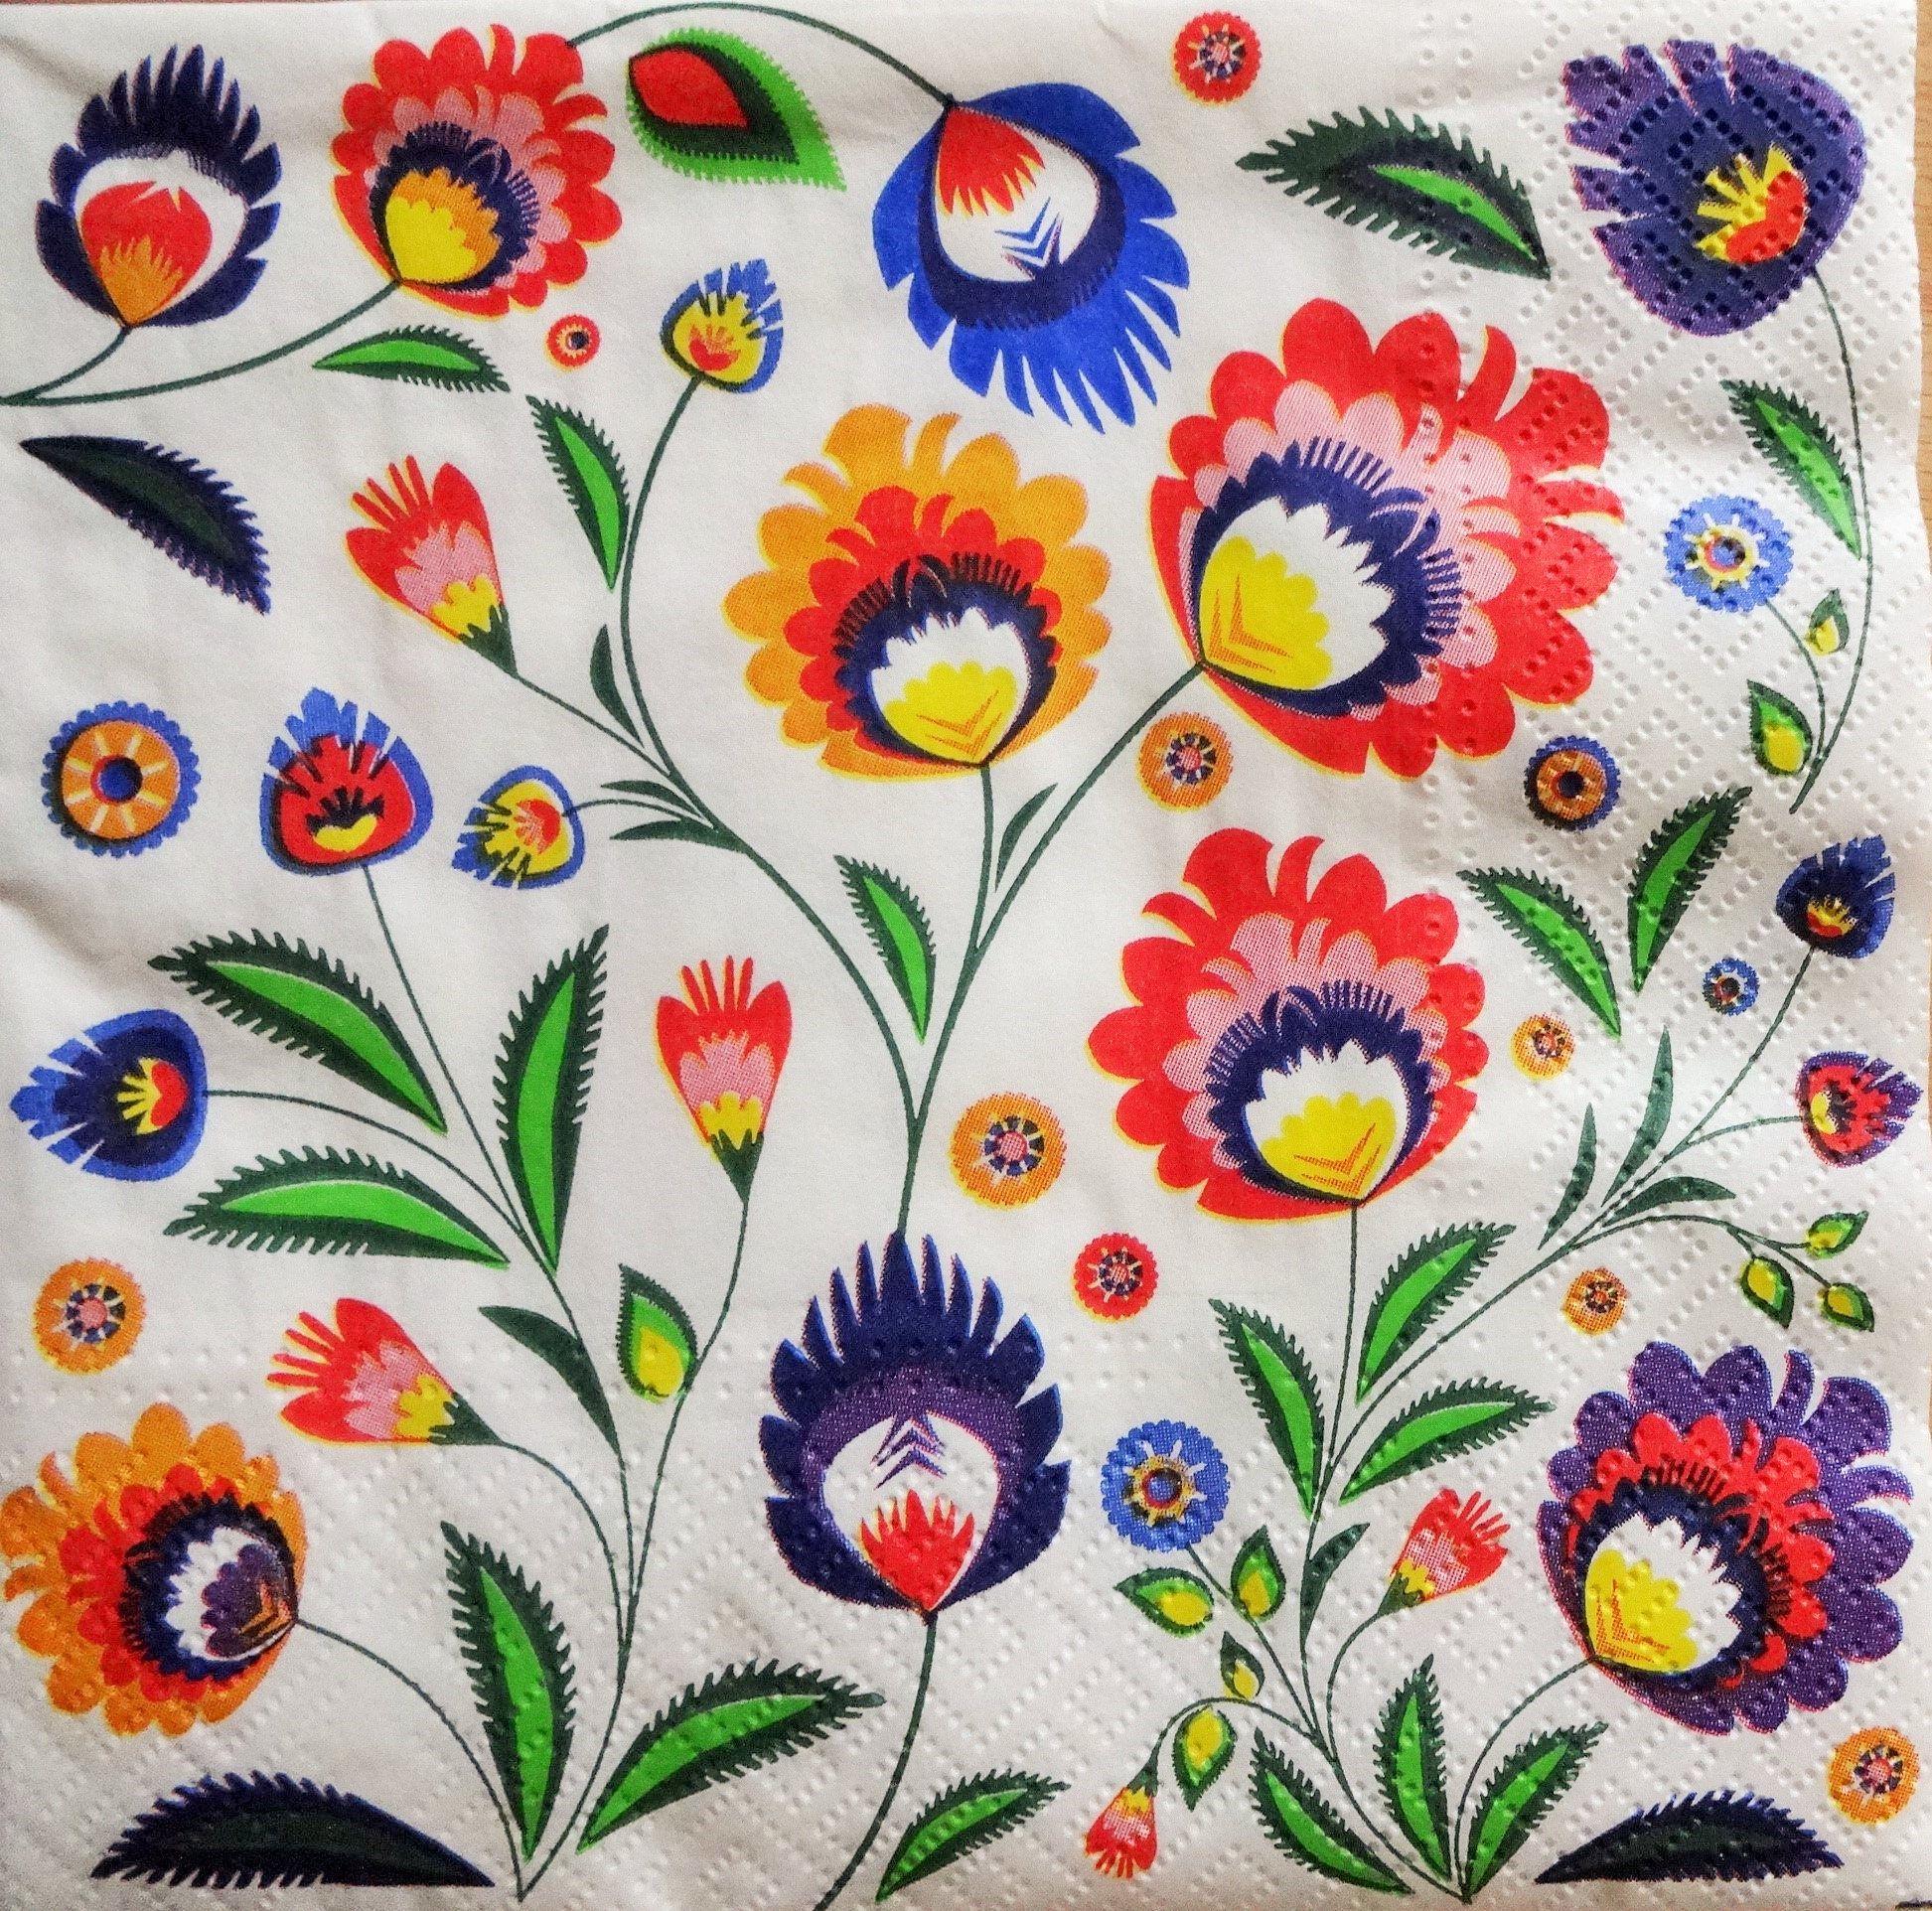 8c57722a 4 Multicolored Paper Napkins, Napkin for Decoupage, Collage Napkins ...